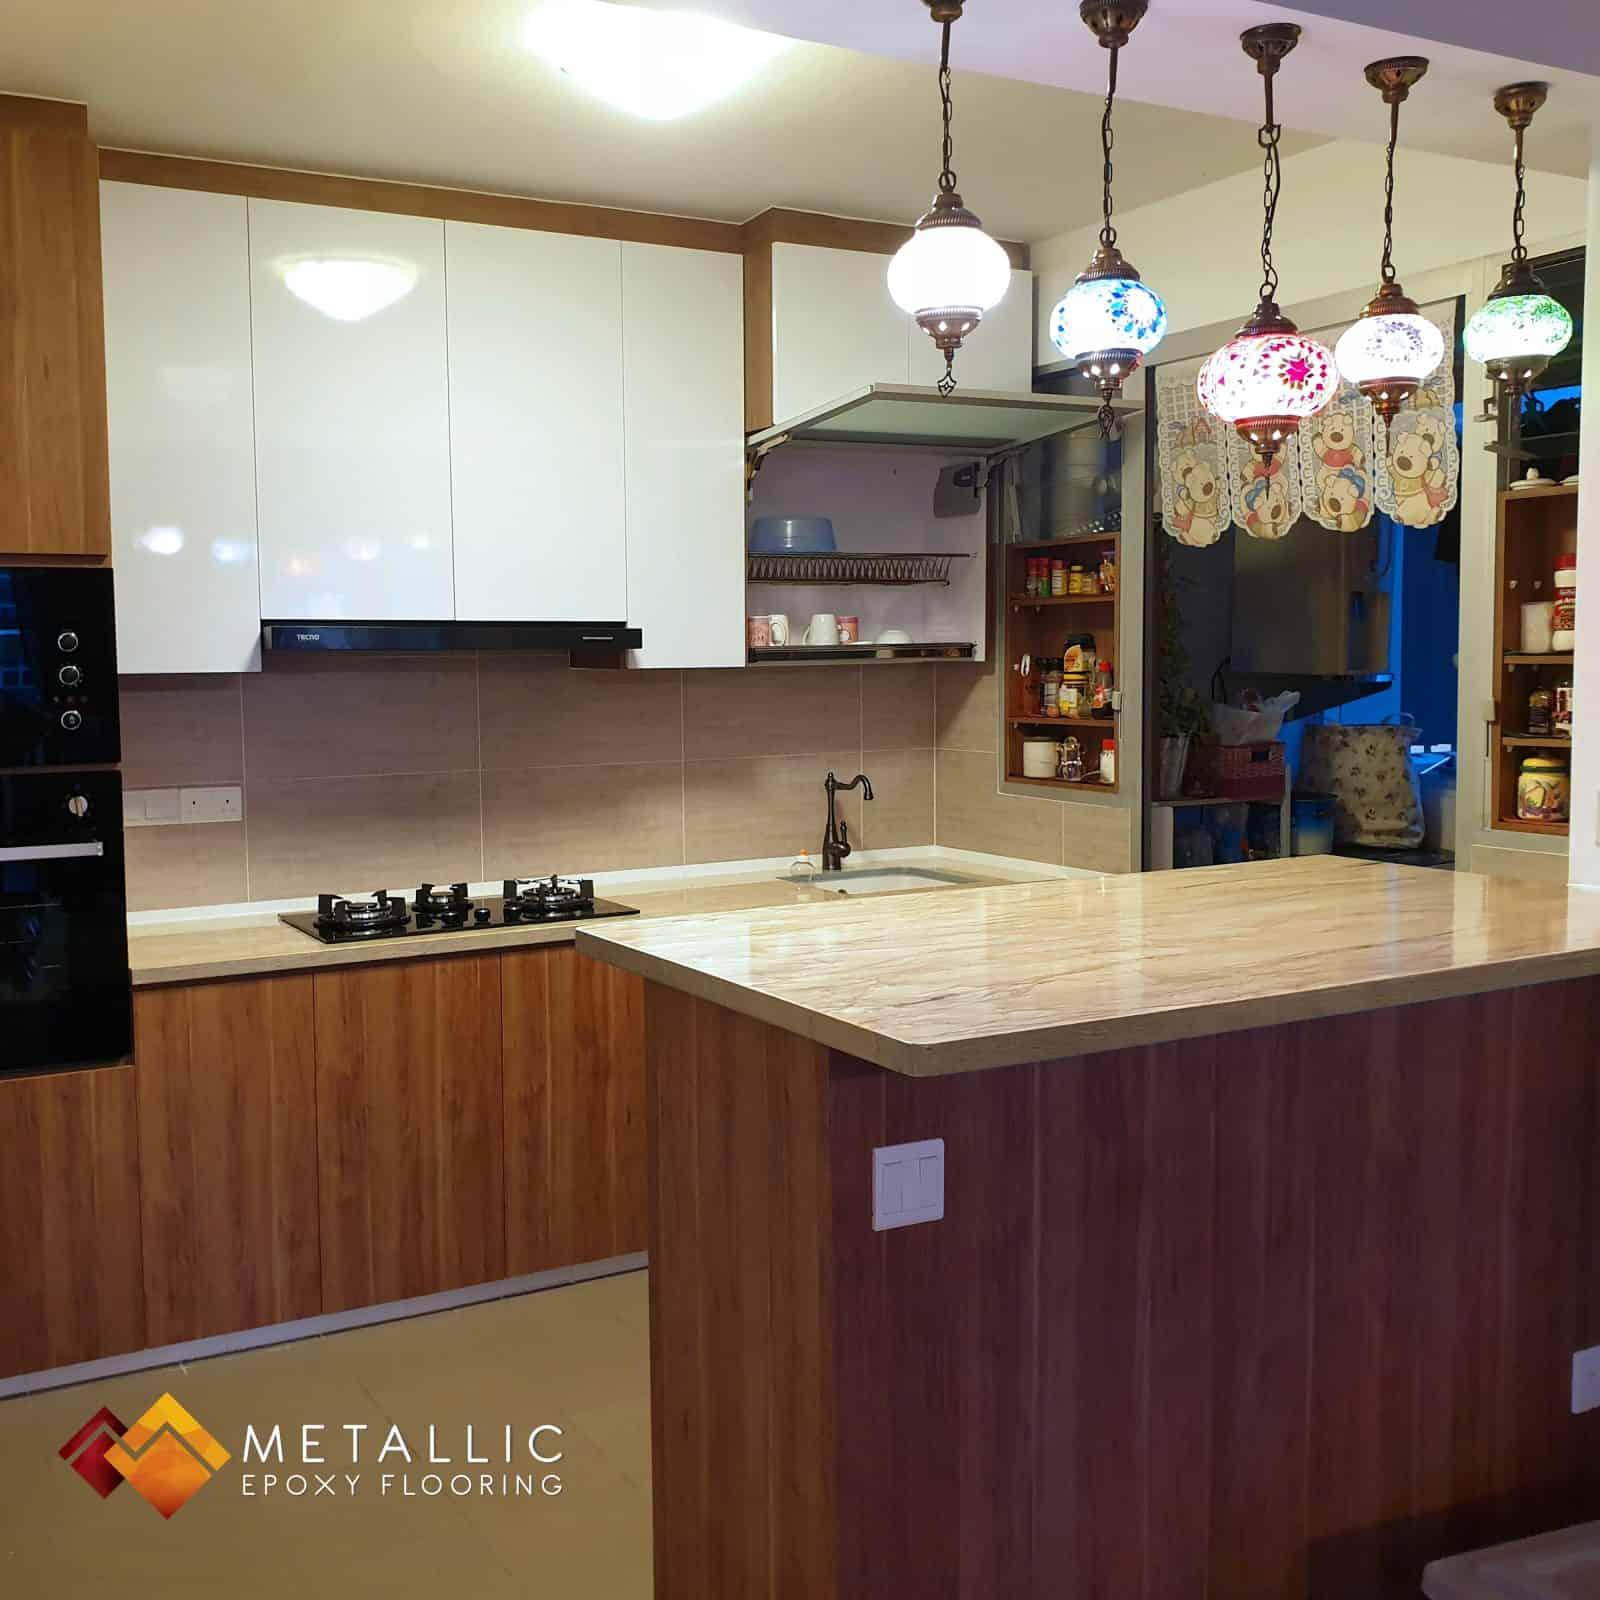 Wood metallic epoxy singapore countertop